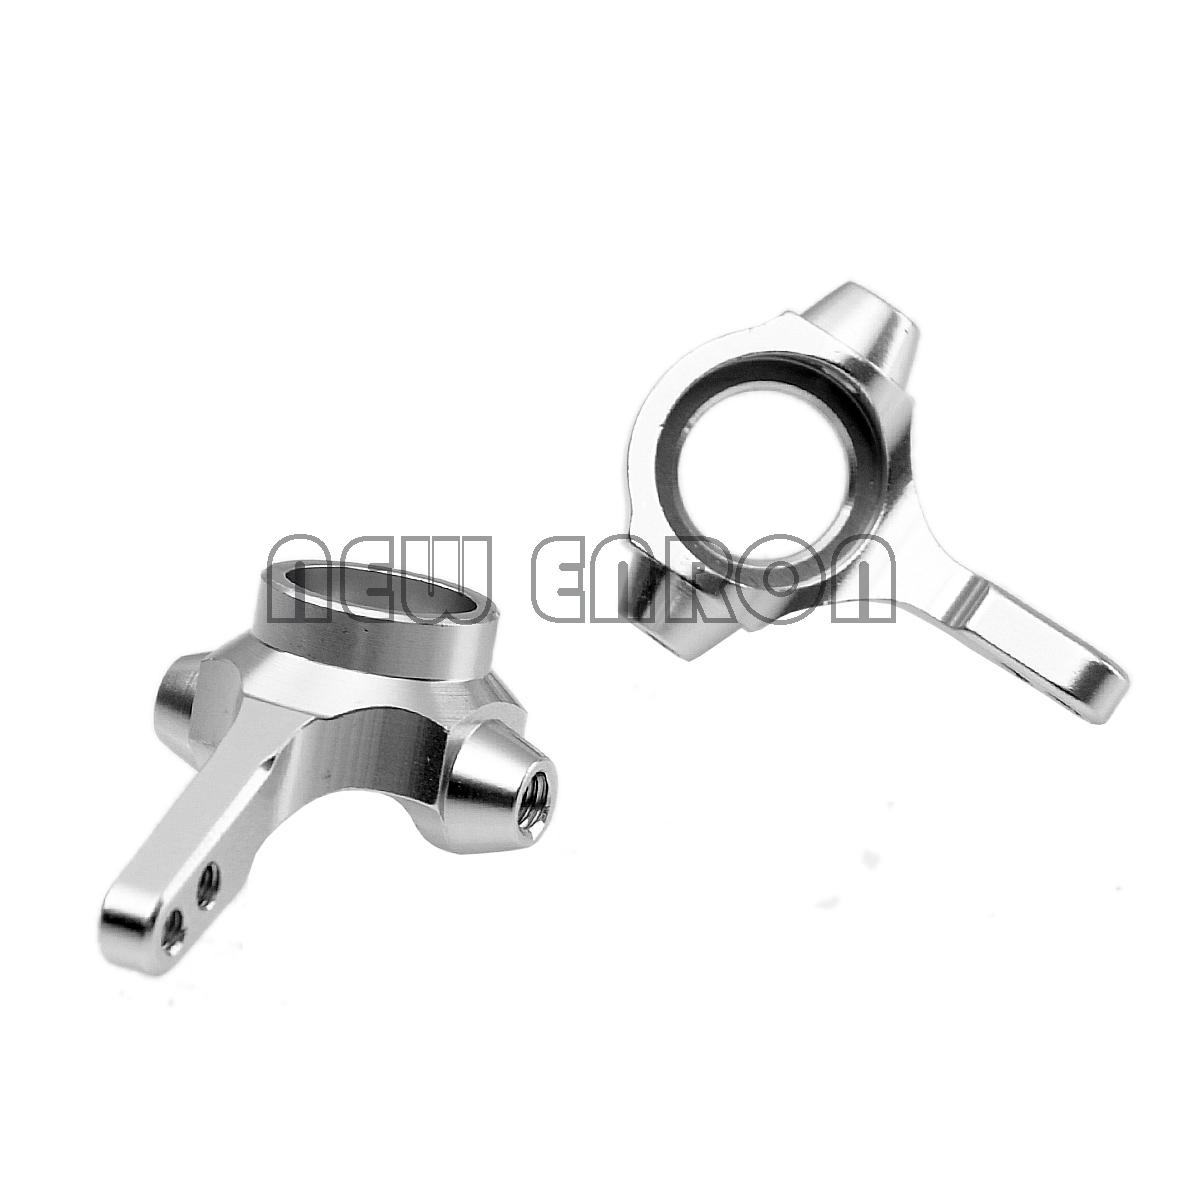 Blue Aluminum Front Knuckle Arm FOR RC 1//10 TAMIYA CC01 CC-01 TA02 TA03